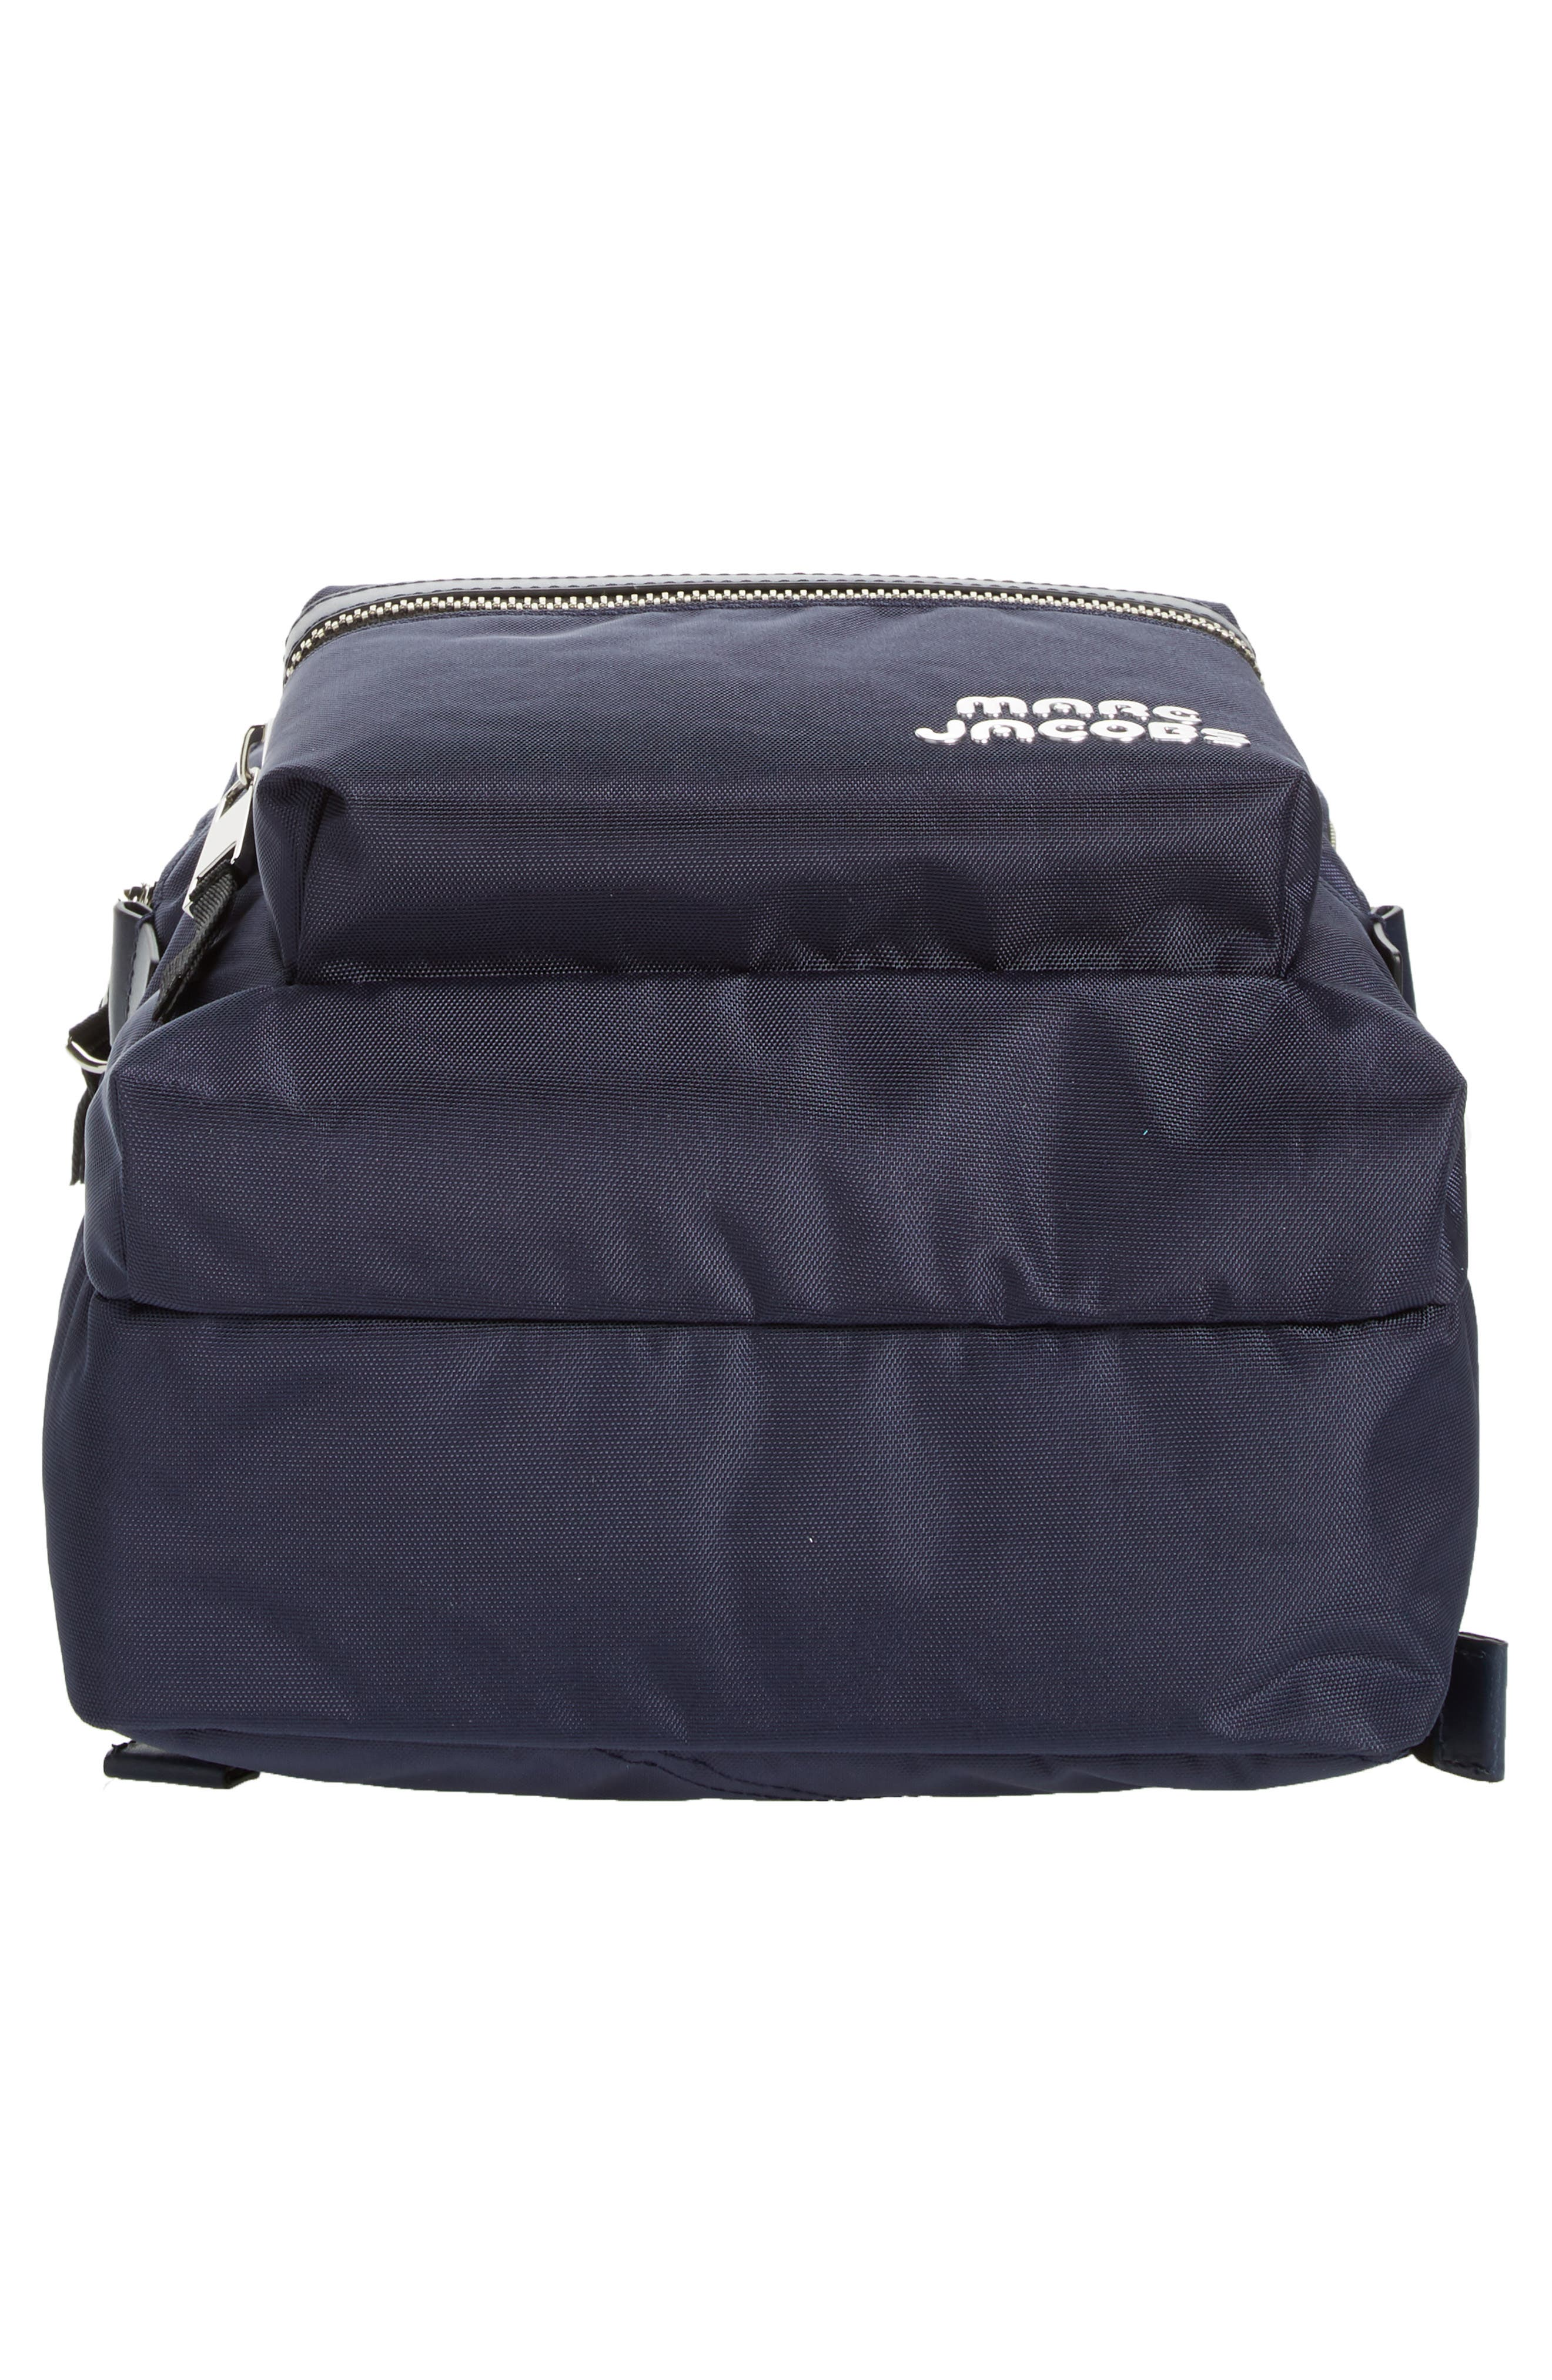 Medium Trek Nylon Backpack,                             Alternate thumbnail 6, color,                             MIDNIGHT BLUE